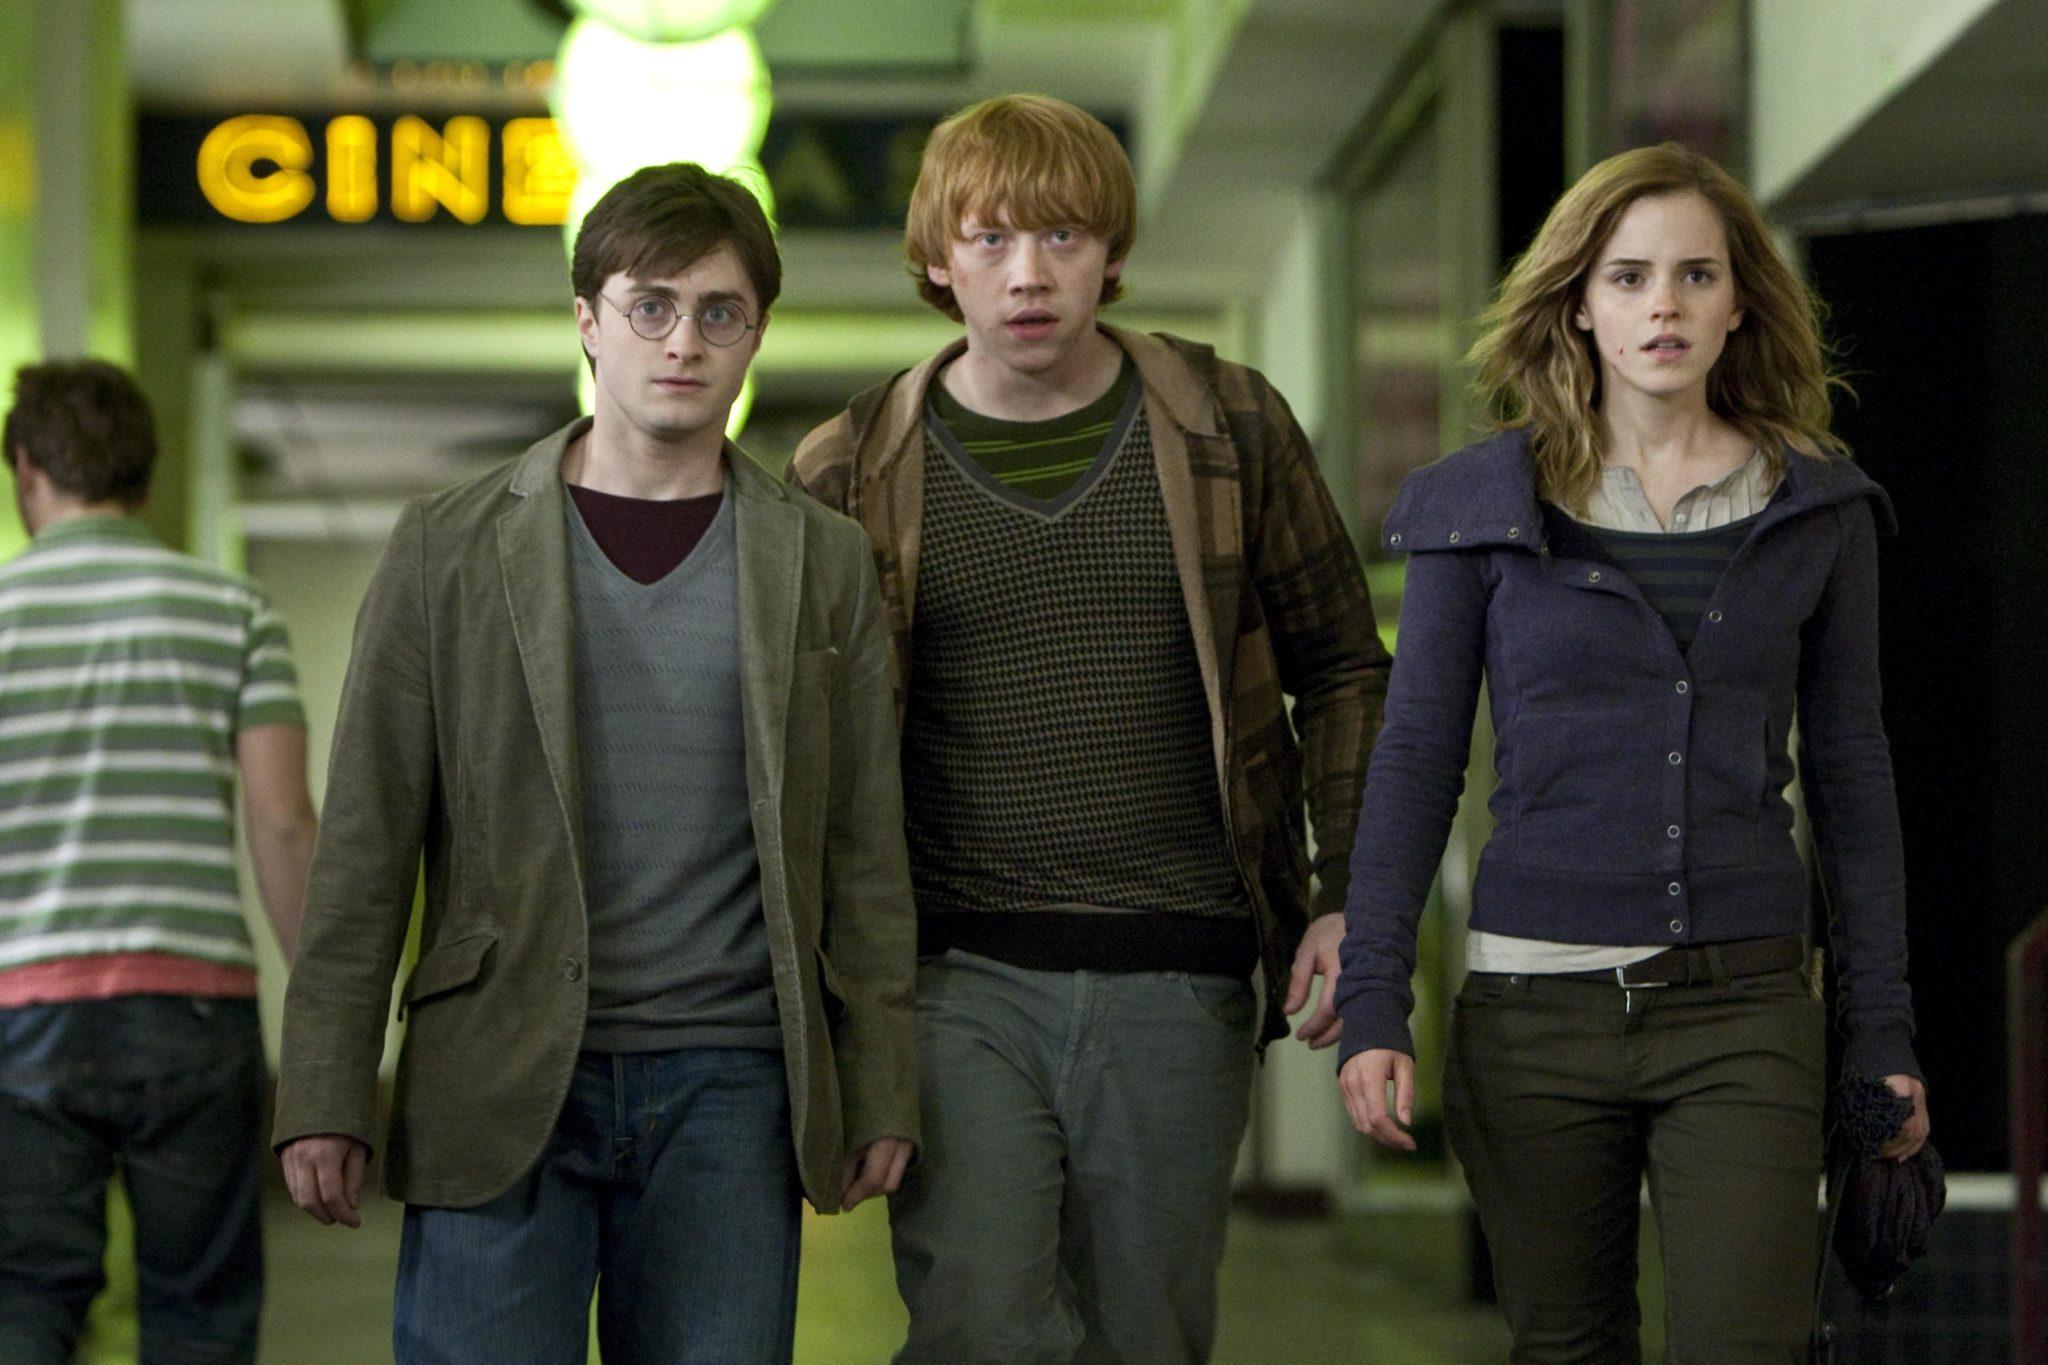 Primera imagen de Harry Potter and the Deathly Hallows